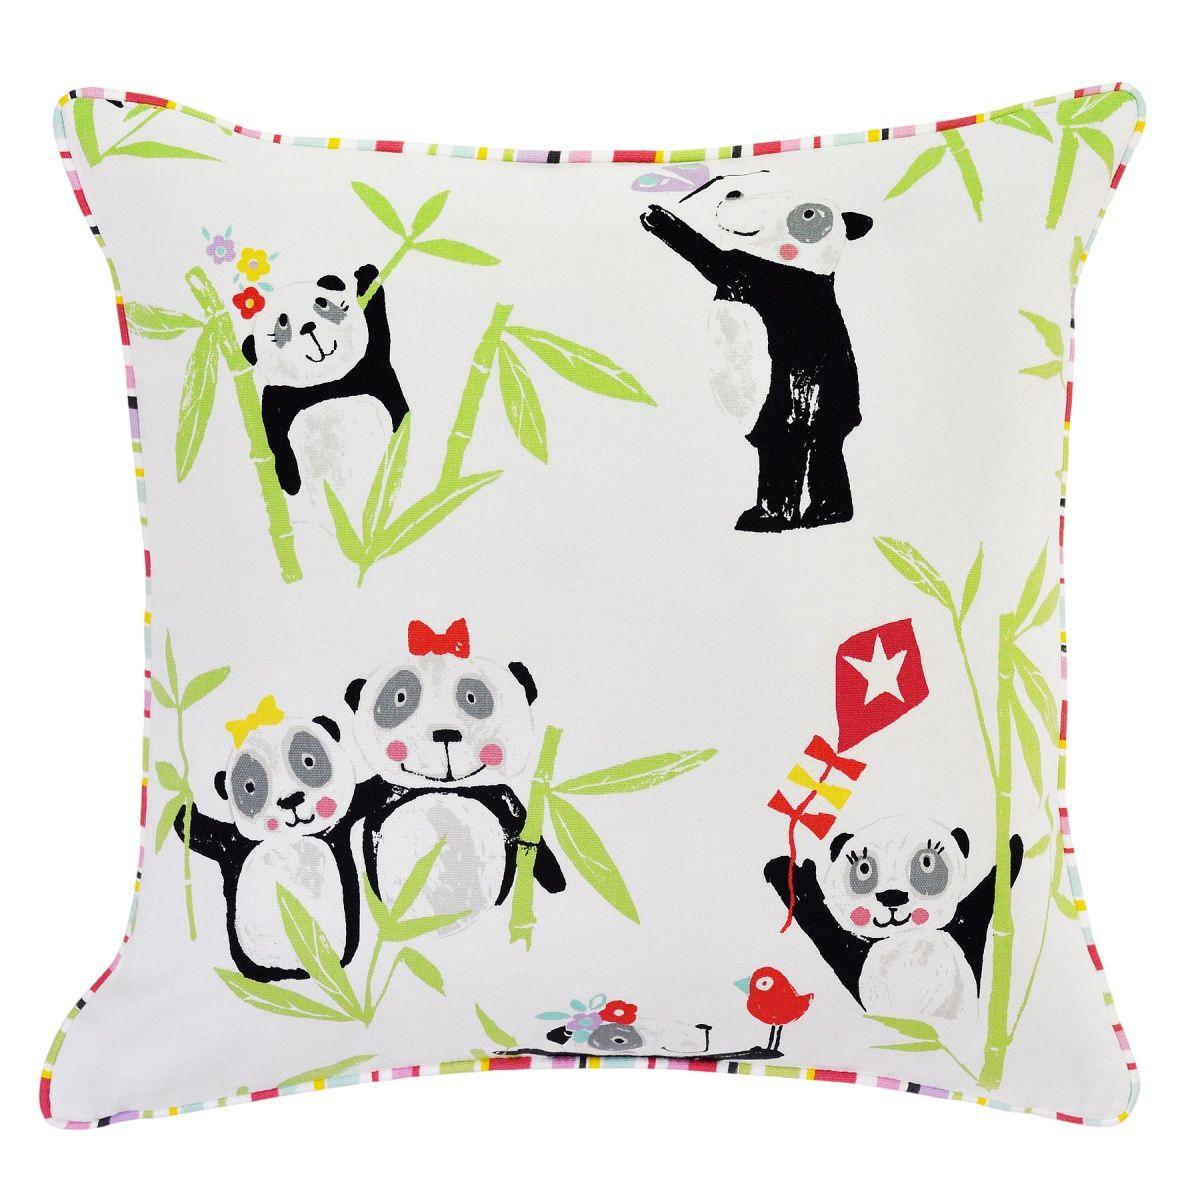 Panda Apple Cushion with Ripley Pink Piping 45x45cm